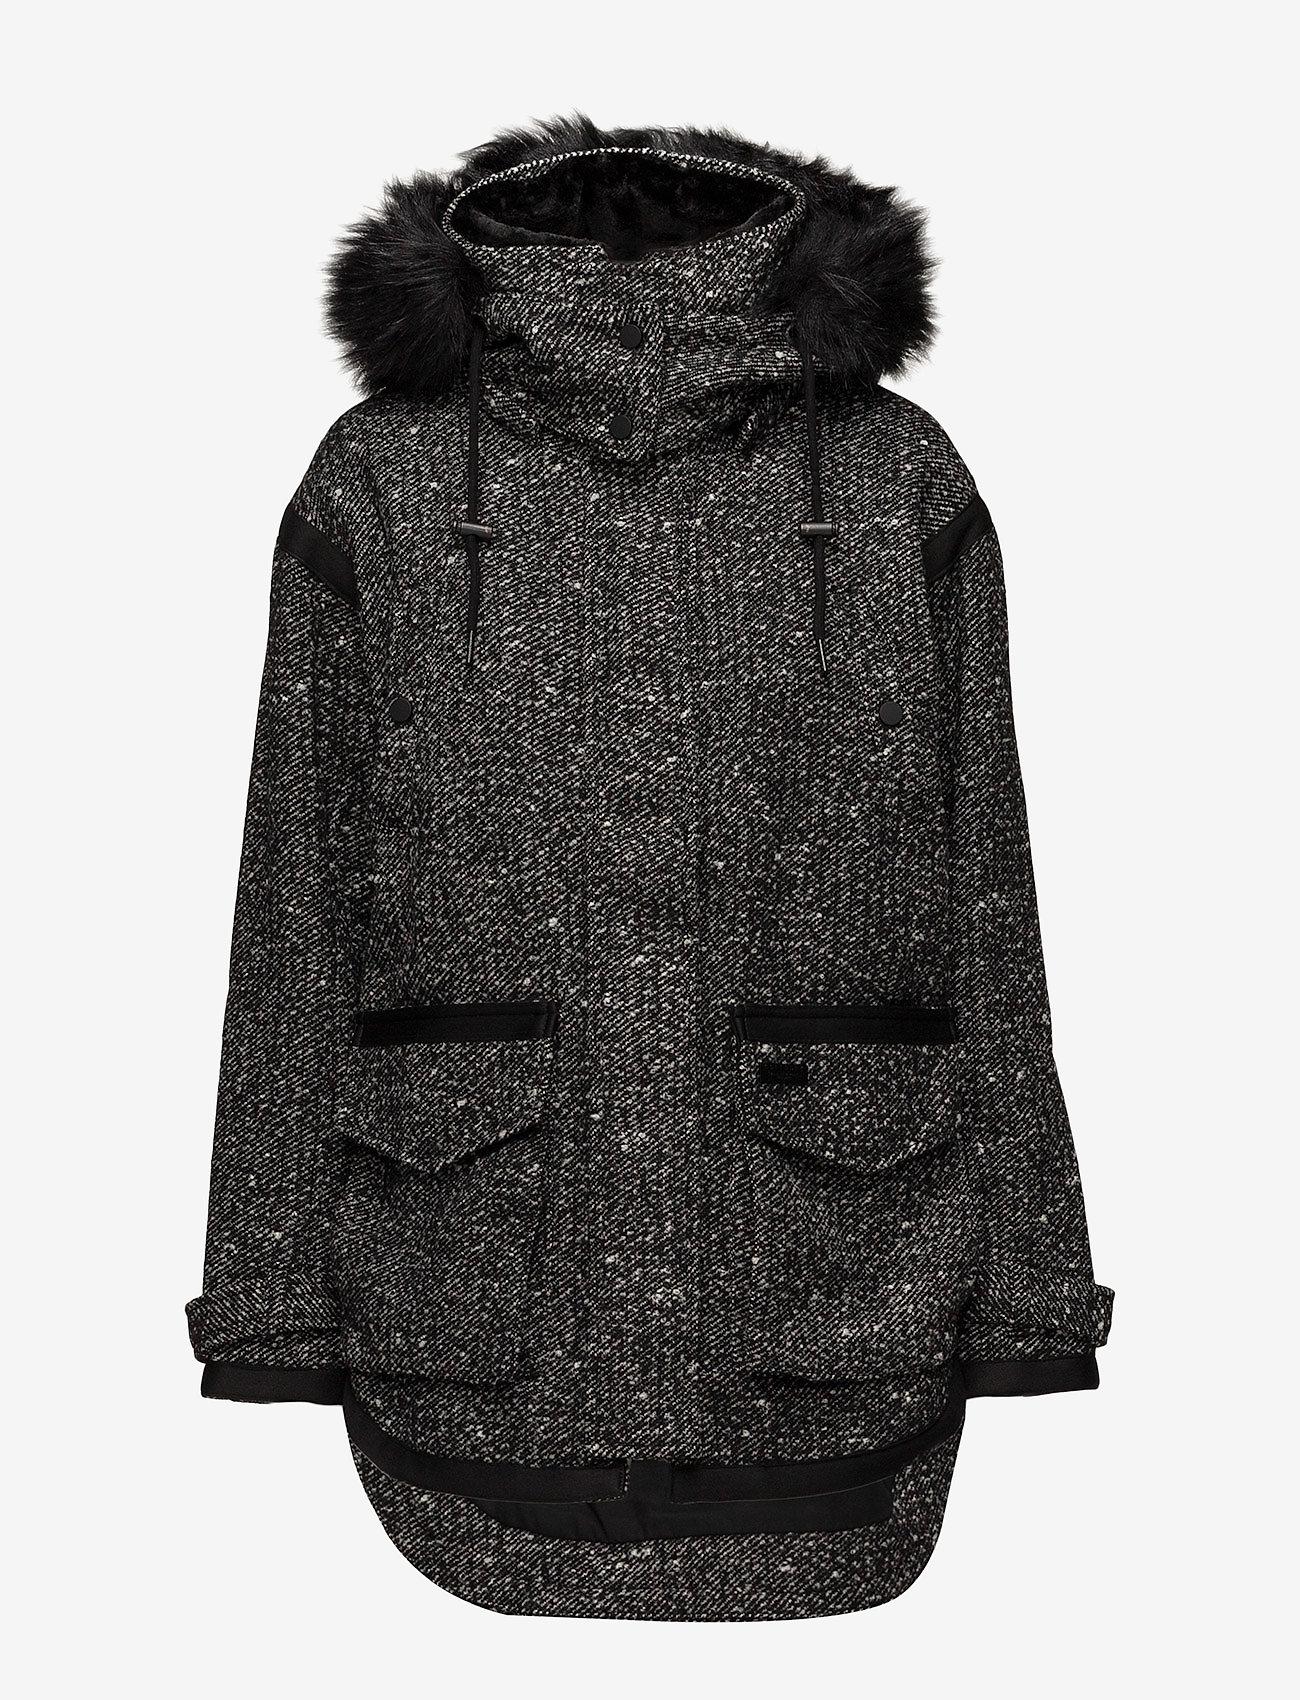 Superdry - FJORD OVOID PARKA - parka coats - grey twill boucle - 1